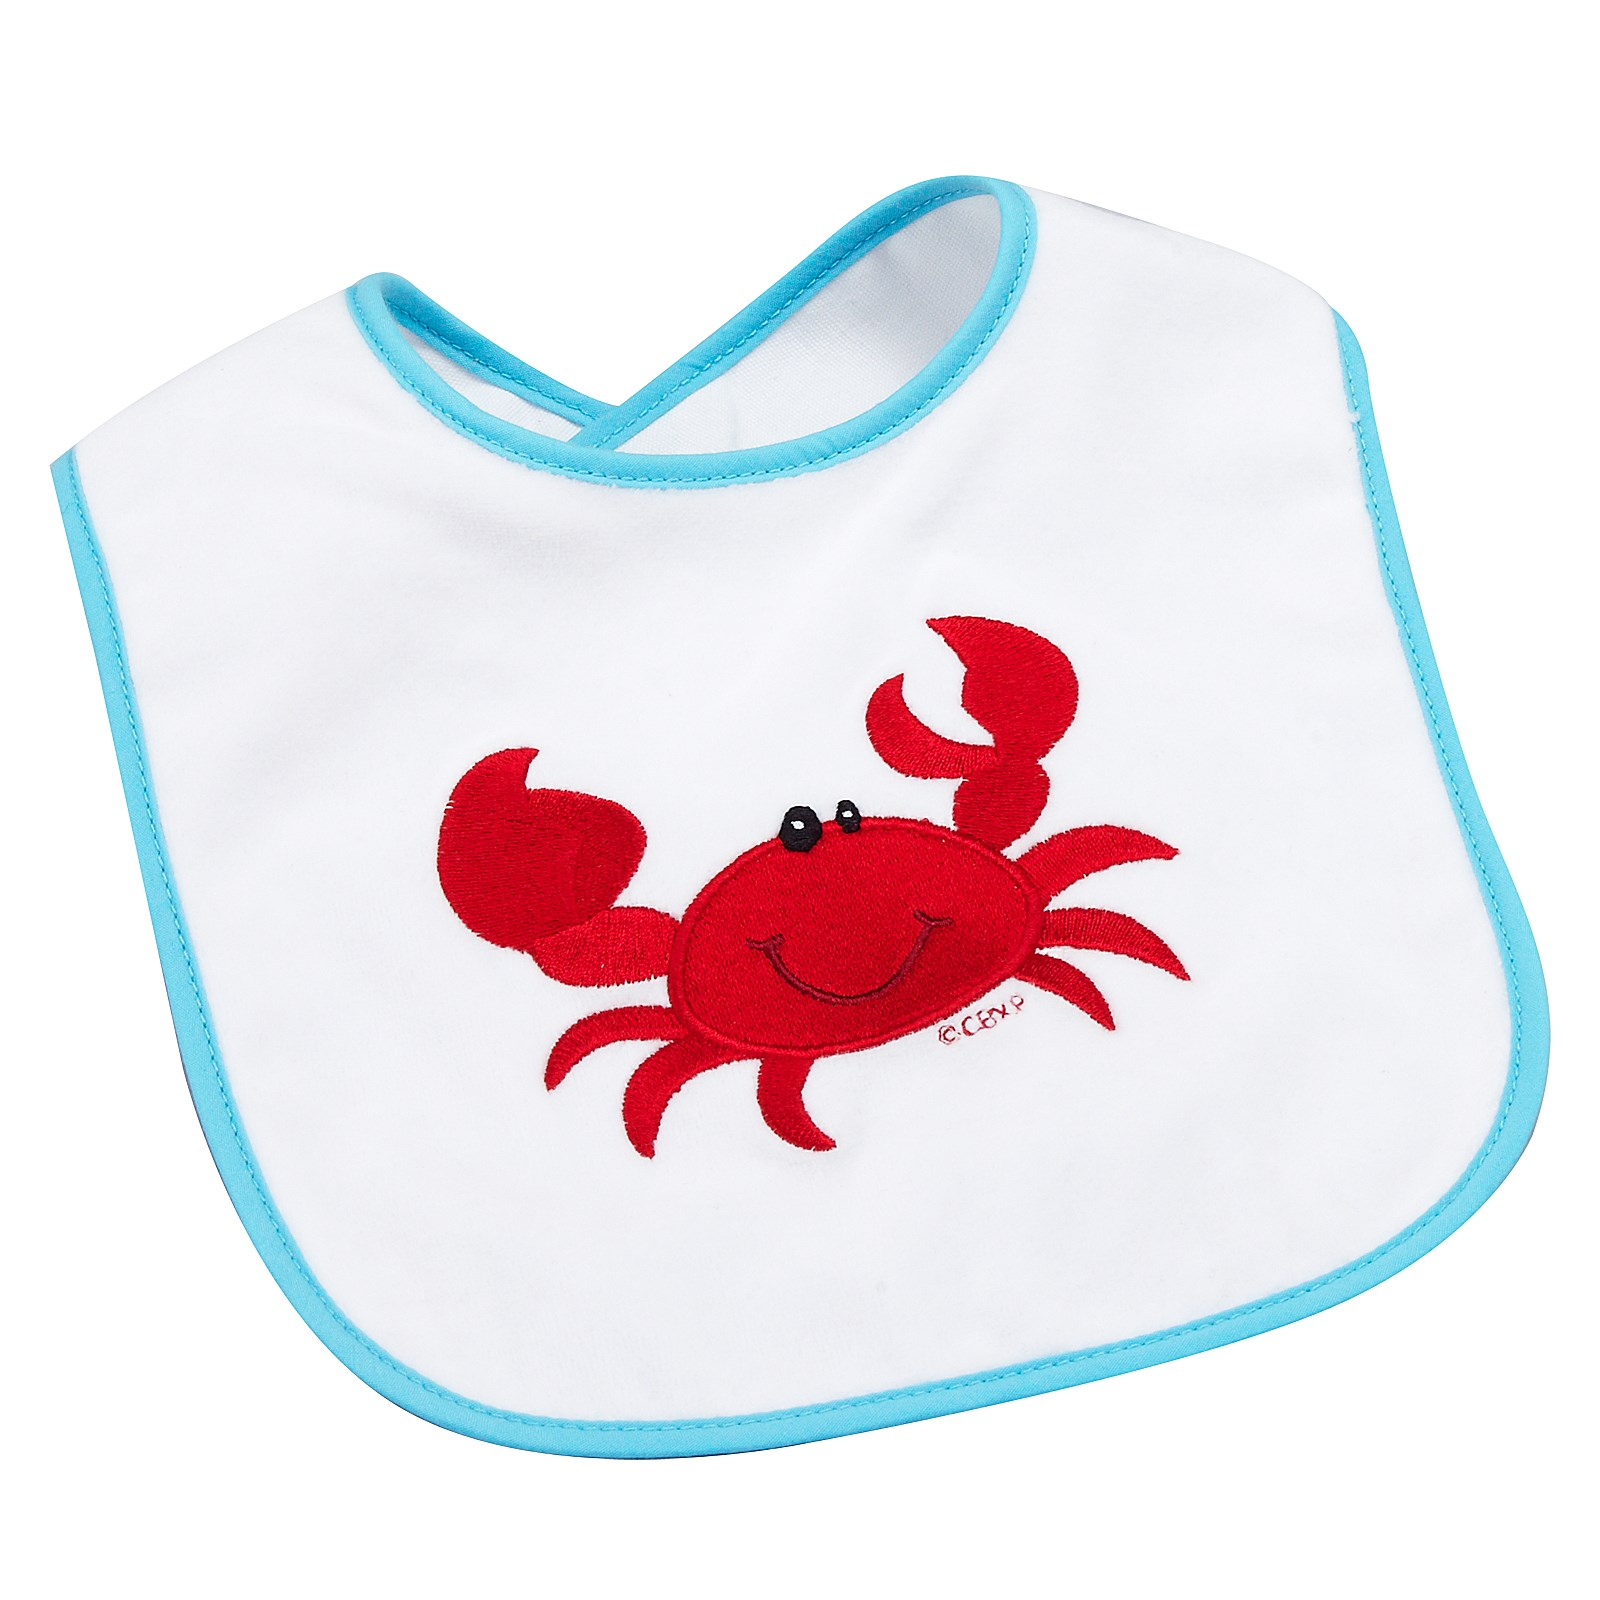 Image of Anchors Aweigh Crab Bib